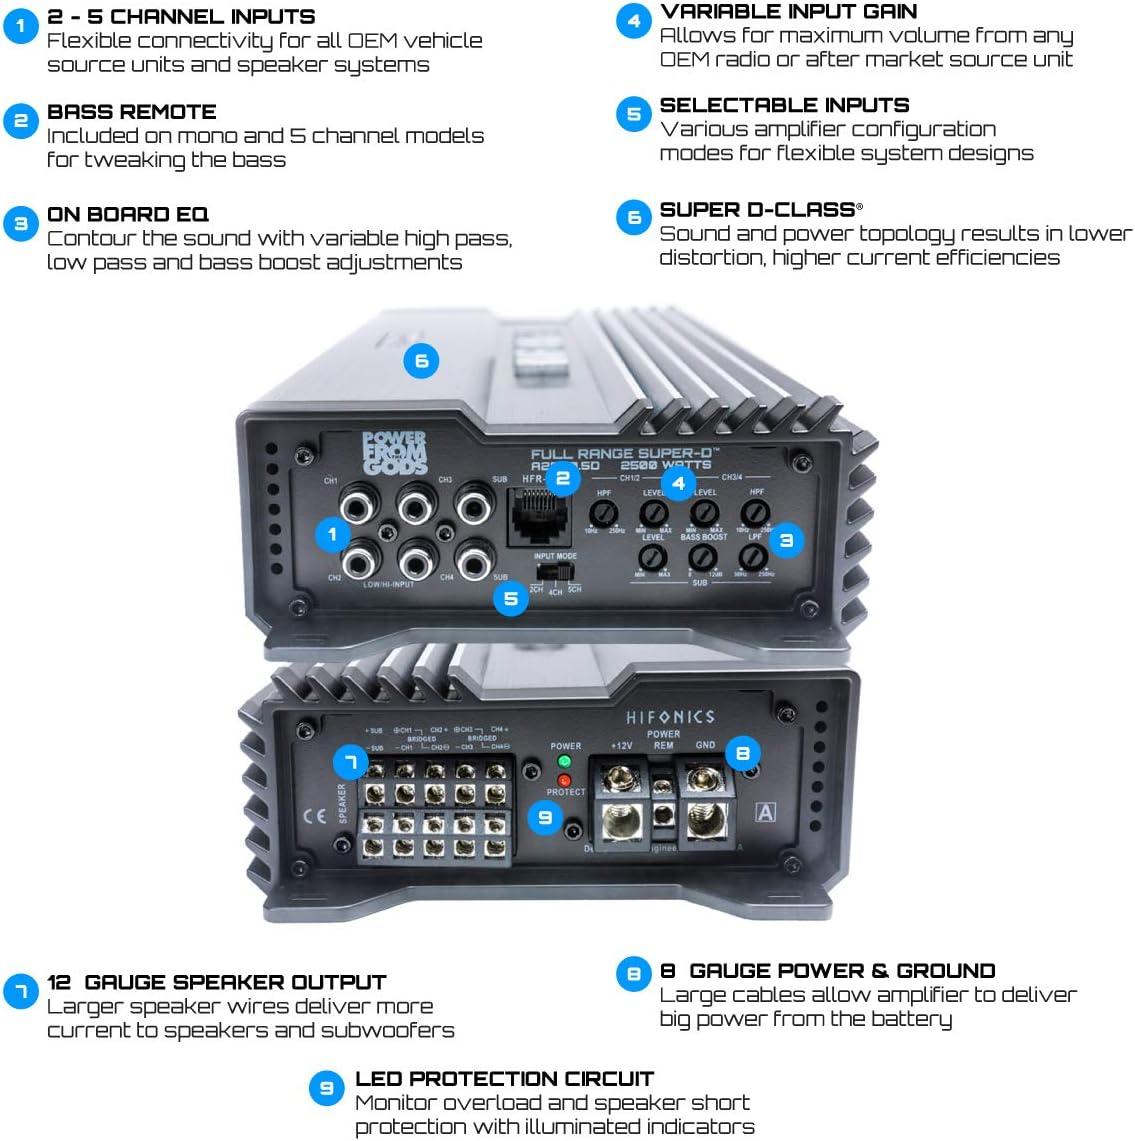 Hifonics Alpha A2500.5D Amplifier Aluminum Heat Sink Auto on 2000 Watt Mono Nickel Plated Super Class D Remote Control